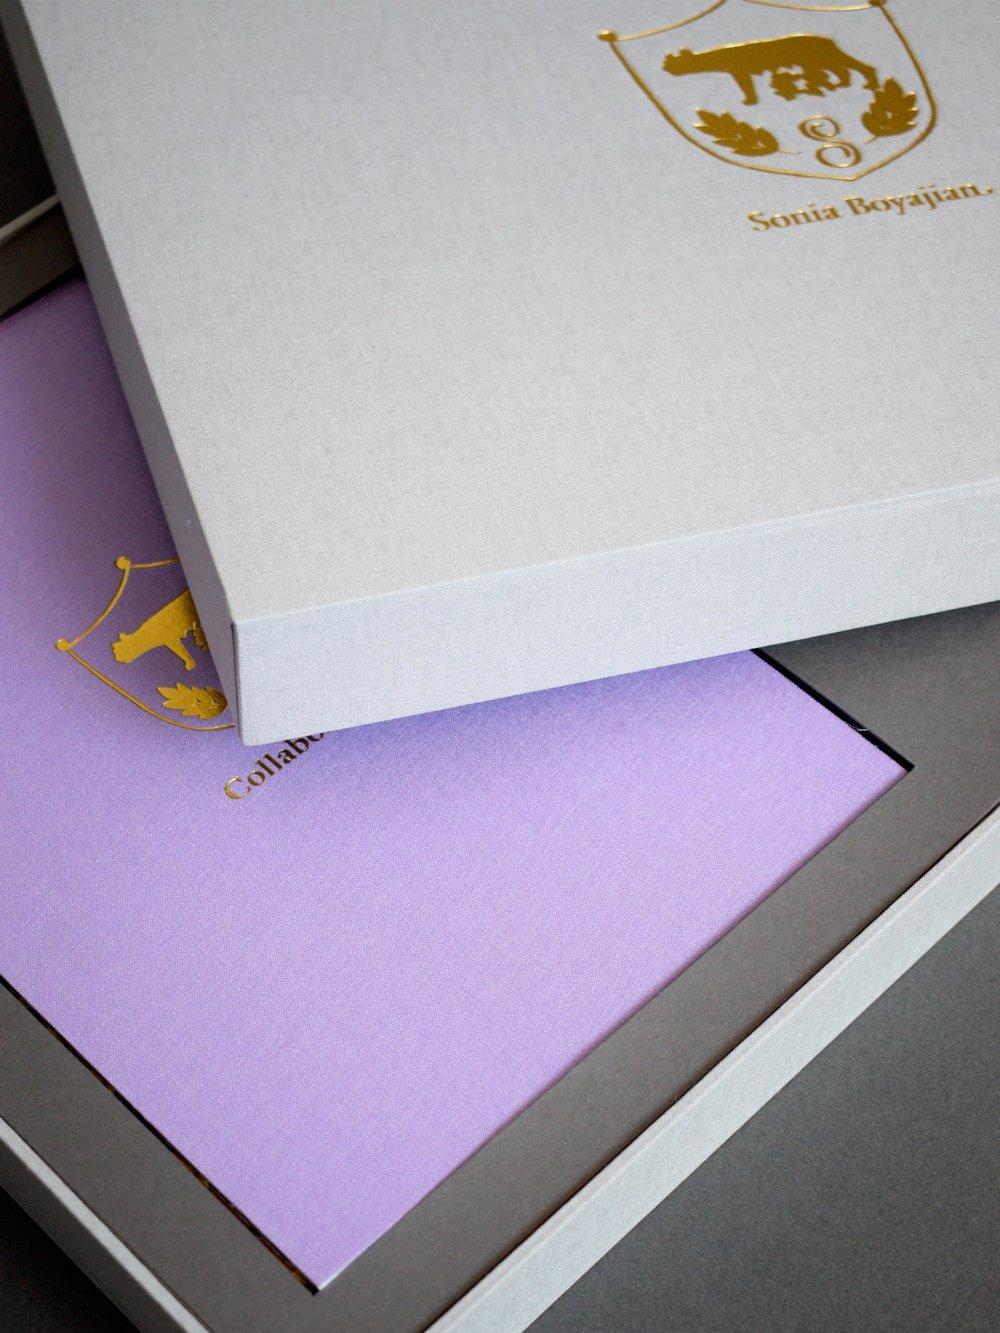 Sonia_B_Press-Pack_03.jpg